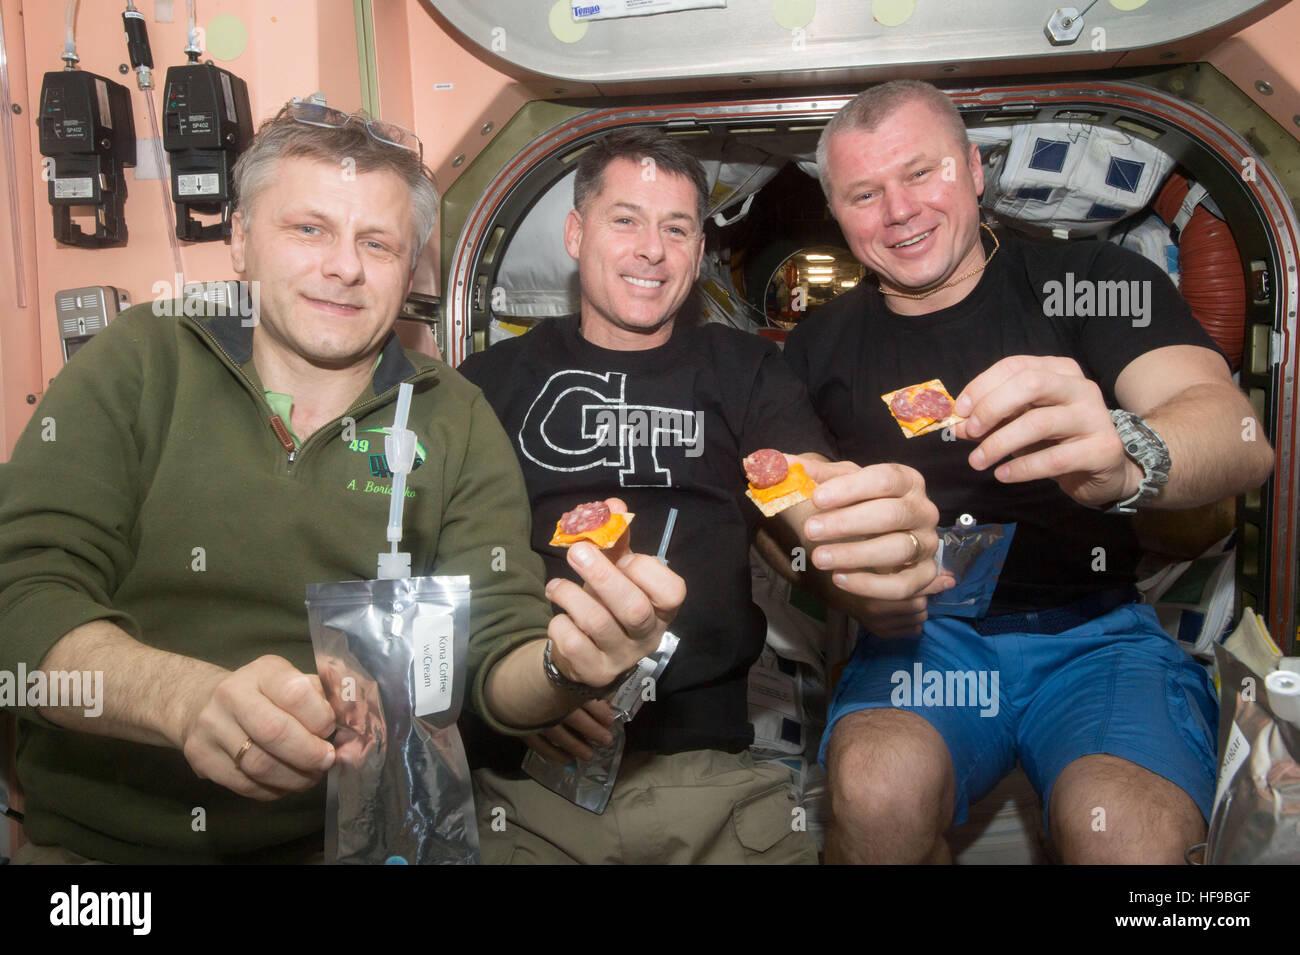 NASA Expedition 50 prime crew members (L-R) Russian cosmonaut Andrey Borisenko of Roscosmos, American astronaut - Stock Image